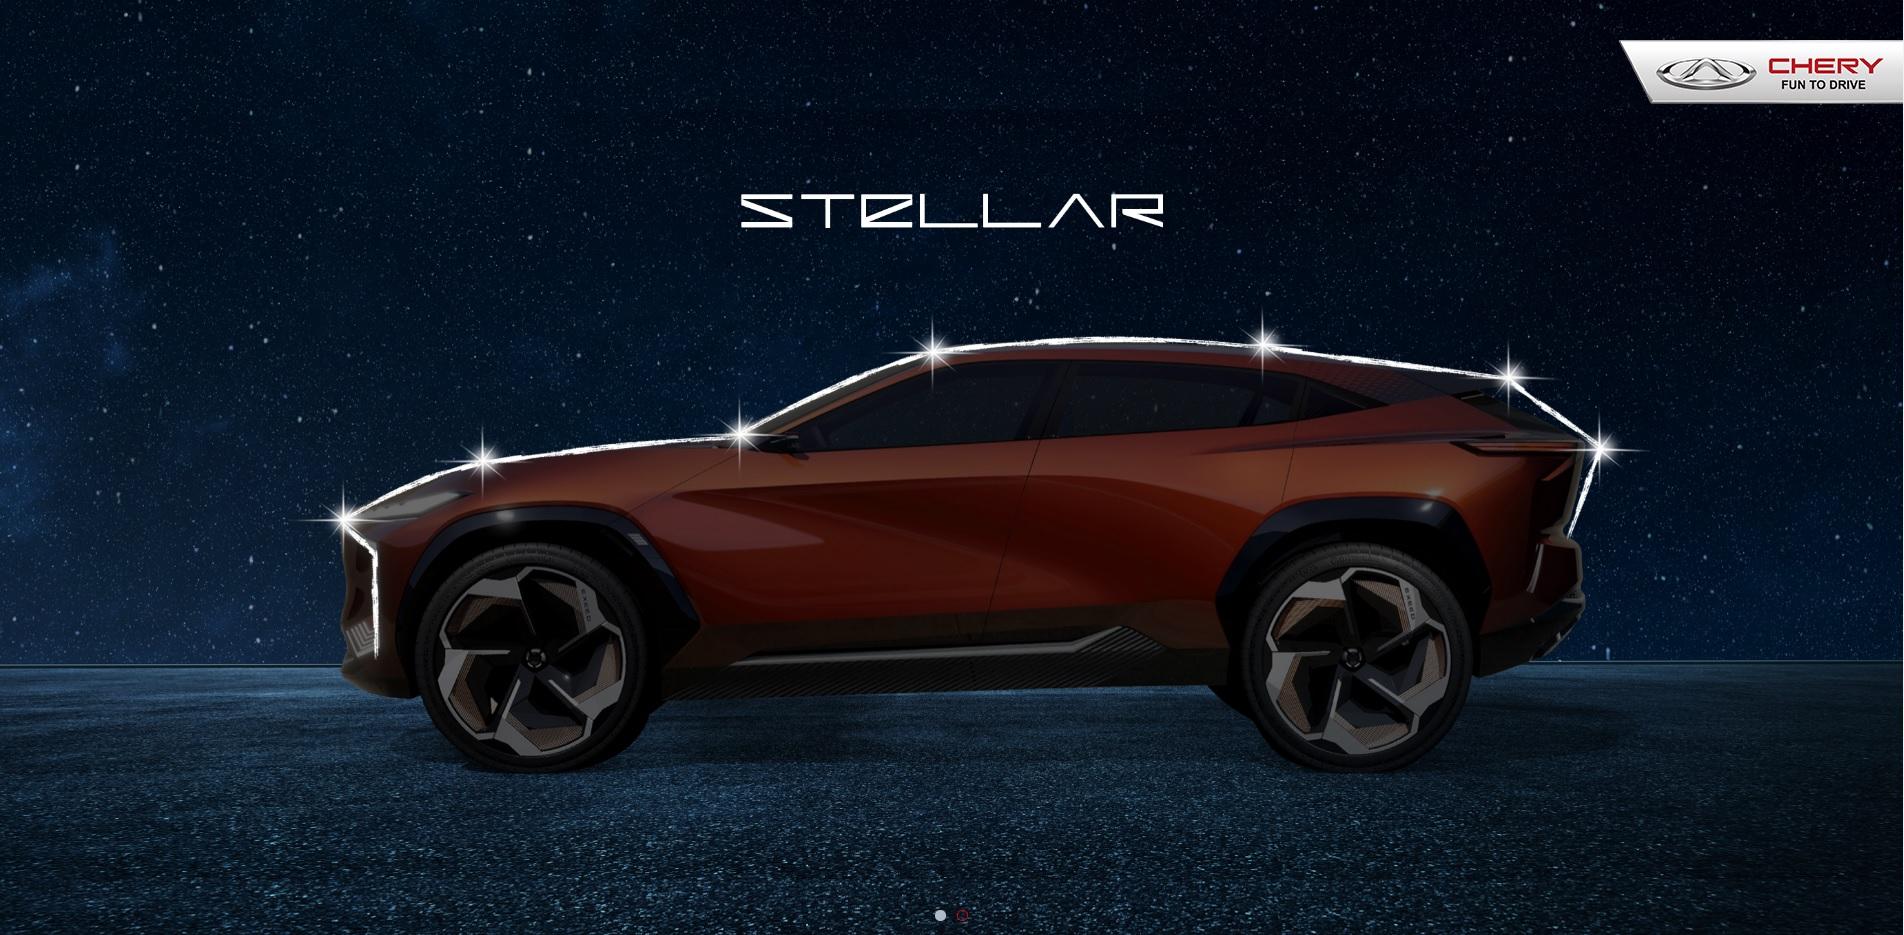 В Шанхае CHERY провела премьеру концепт-кара Stellar бренда EXEED